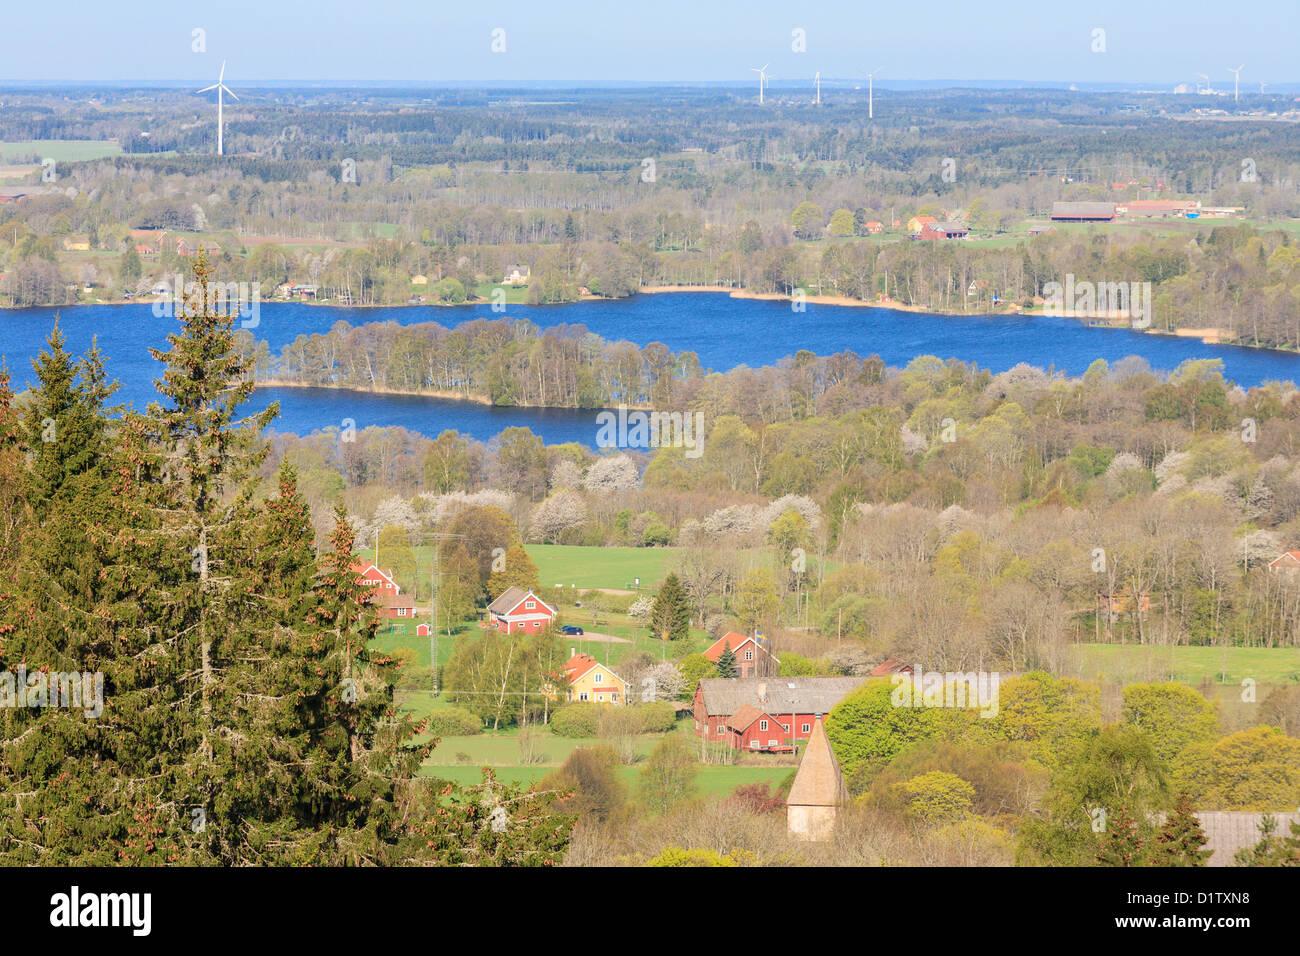 Vue de la vallée de Vastergotland Sweden Banque D'Images